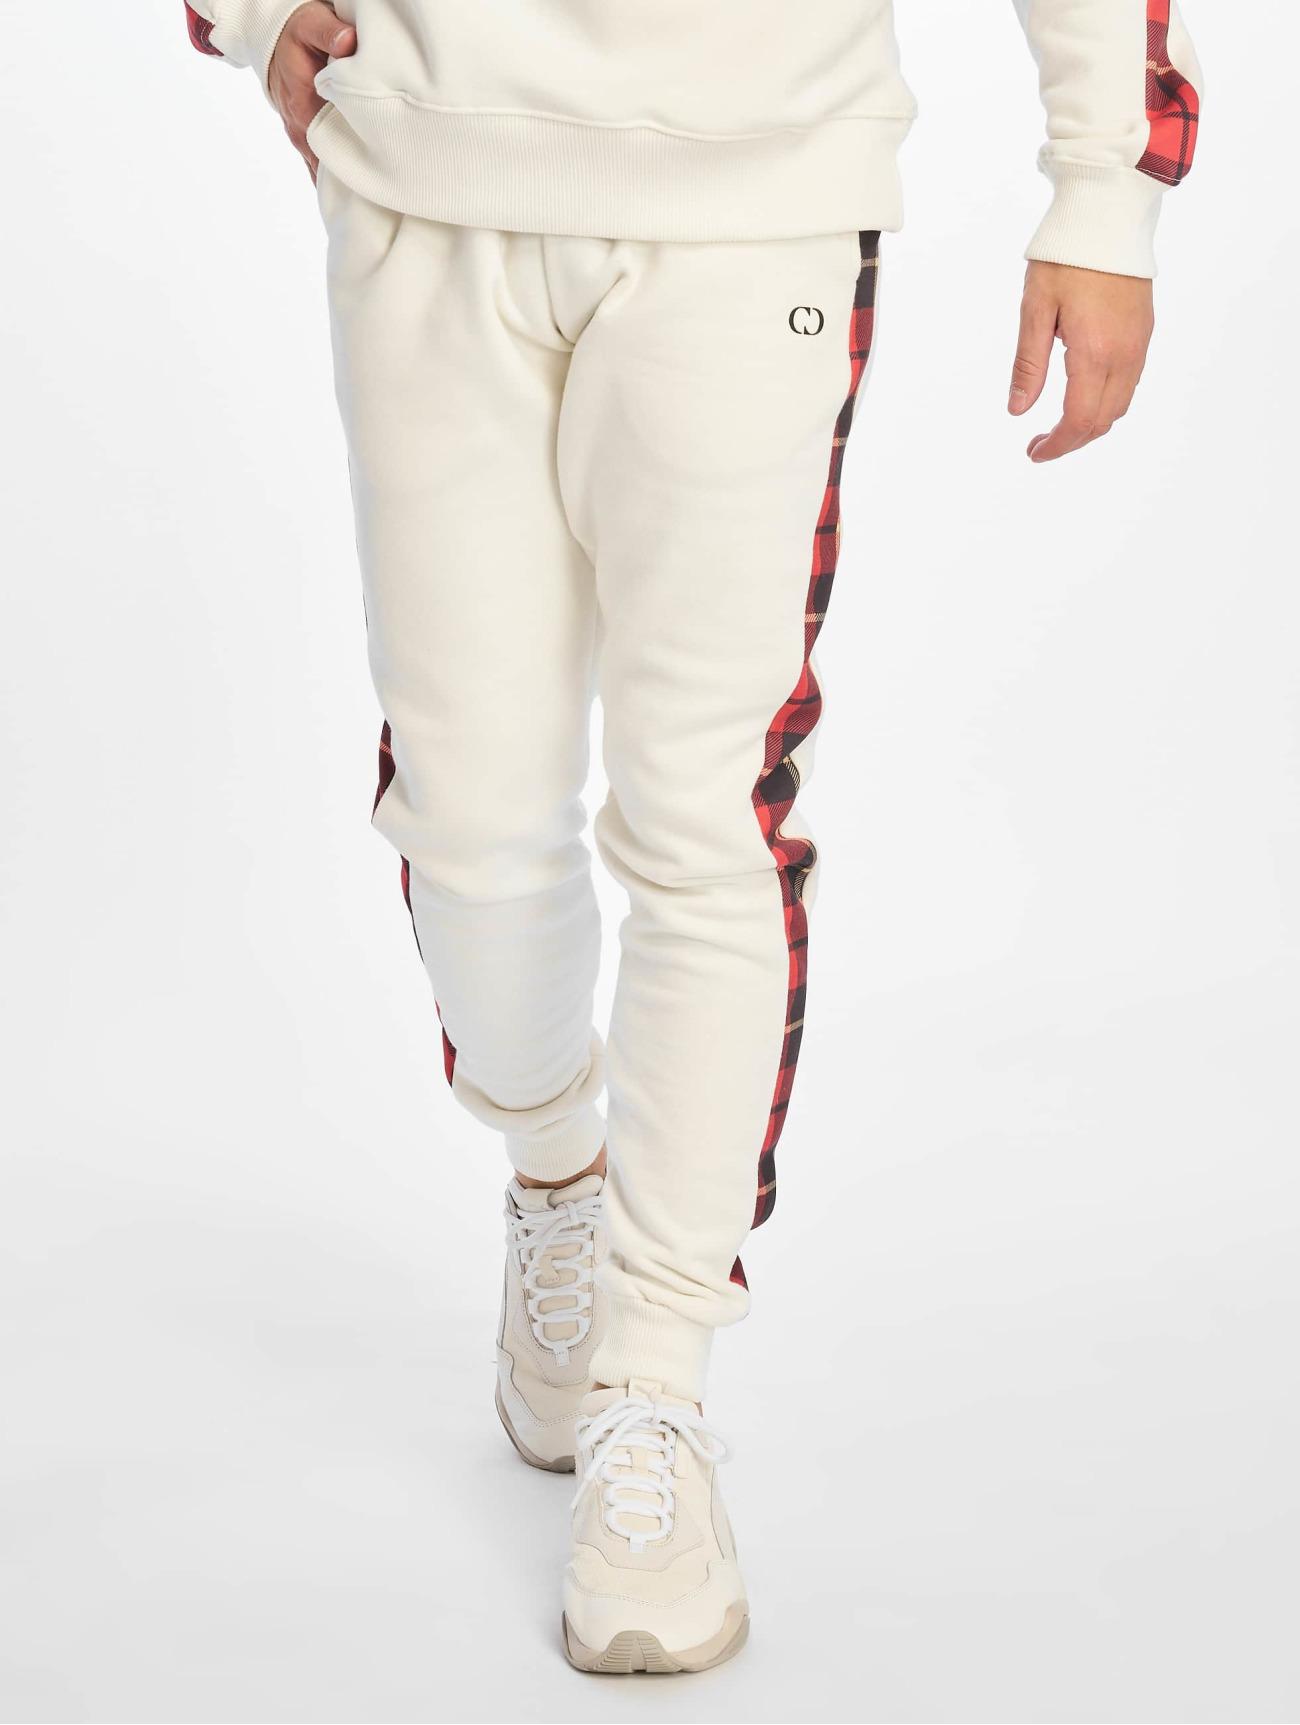 Criminal Damage  Check  blanc Homme Jogging  631415 Homme Pantalons & Shorts